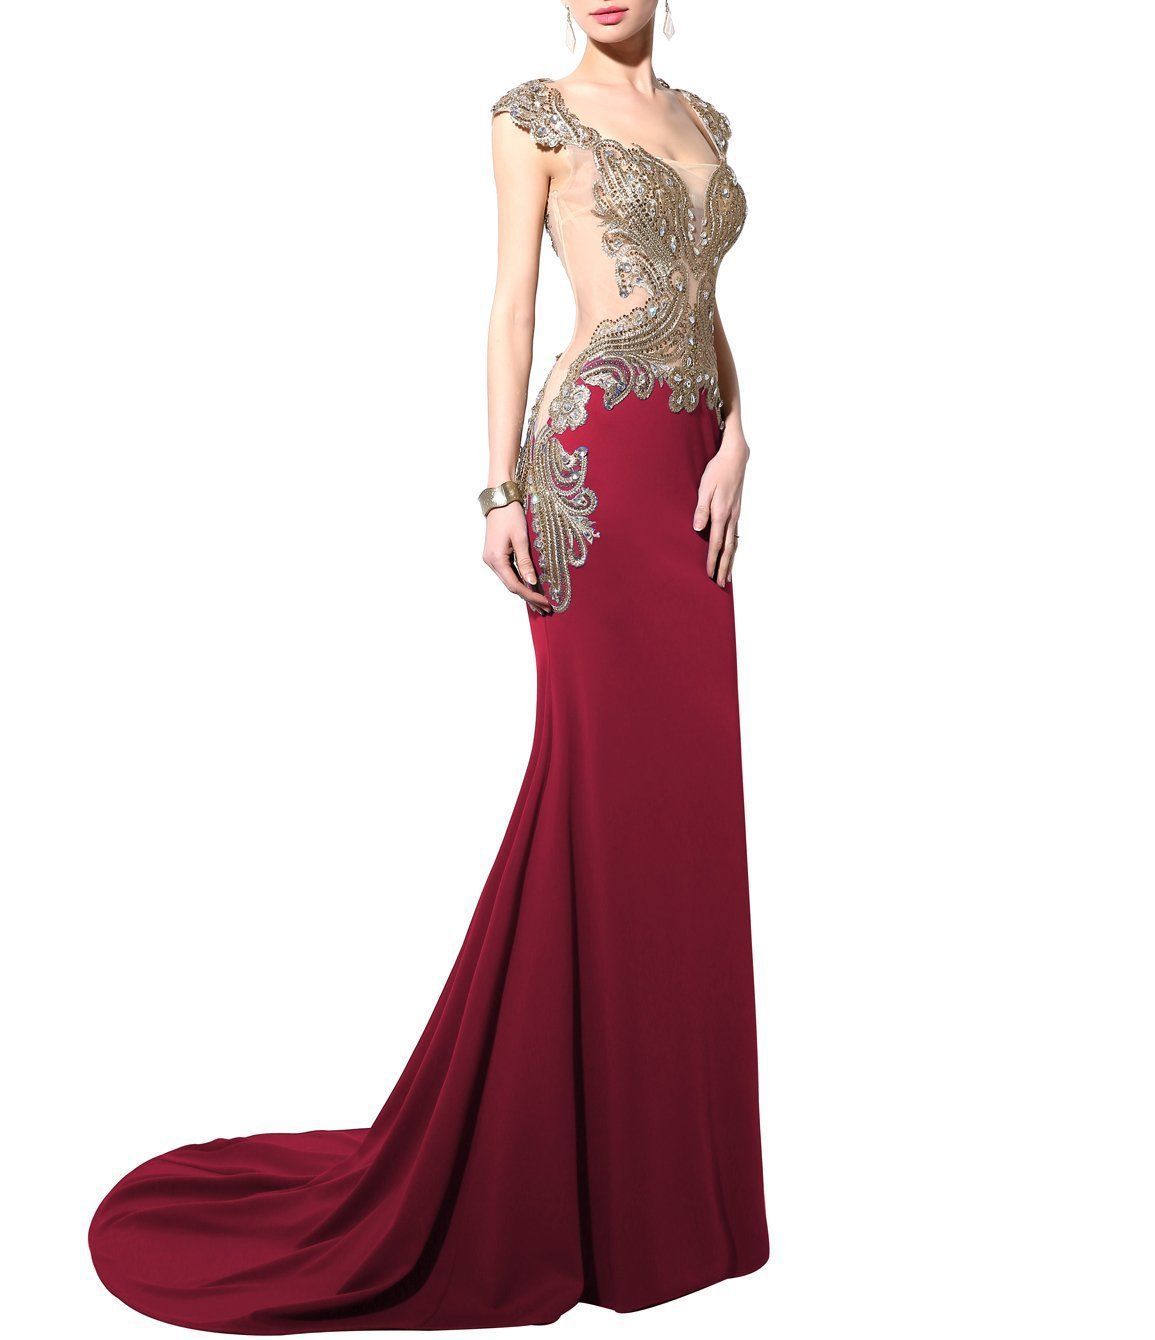 Annieus bridal womenus embroidery long evening dresses mermaid prom